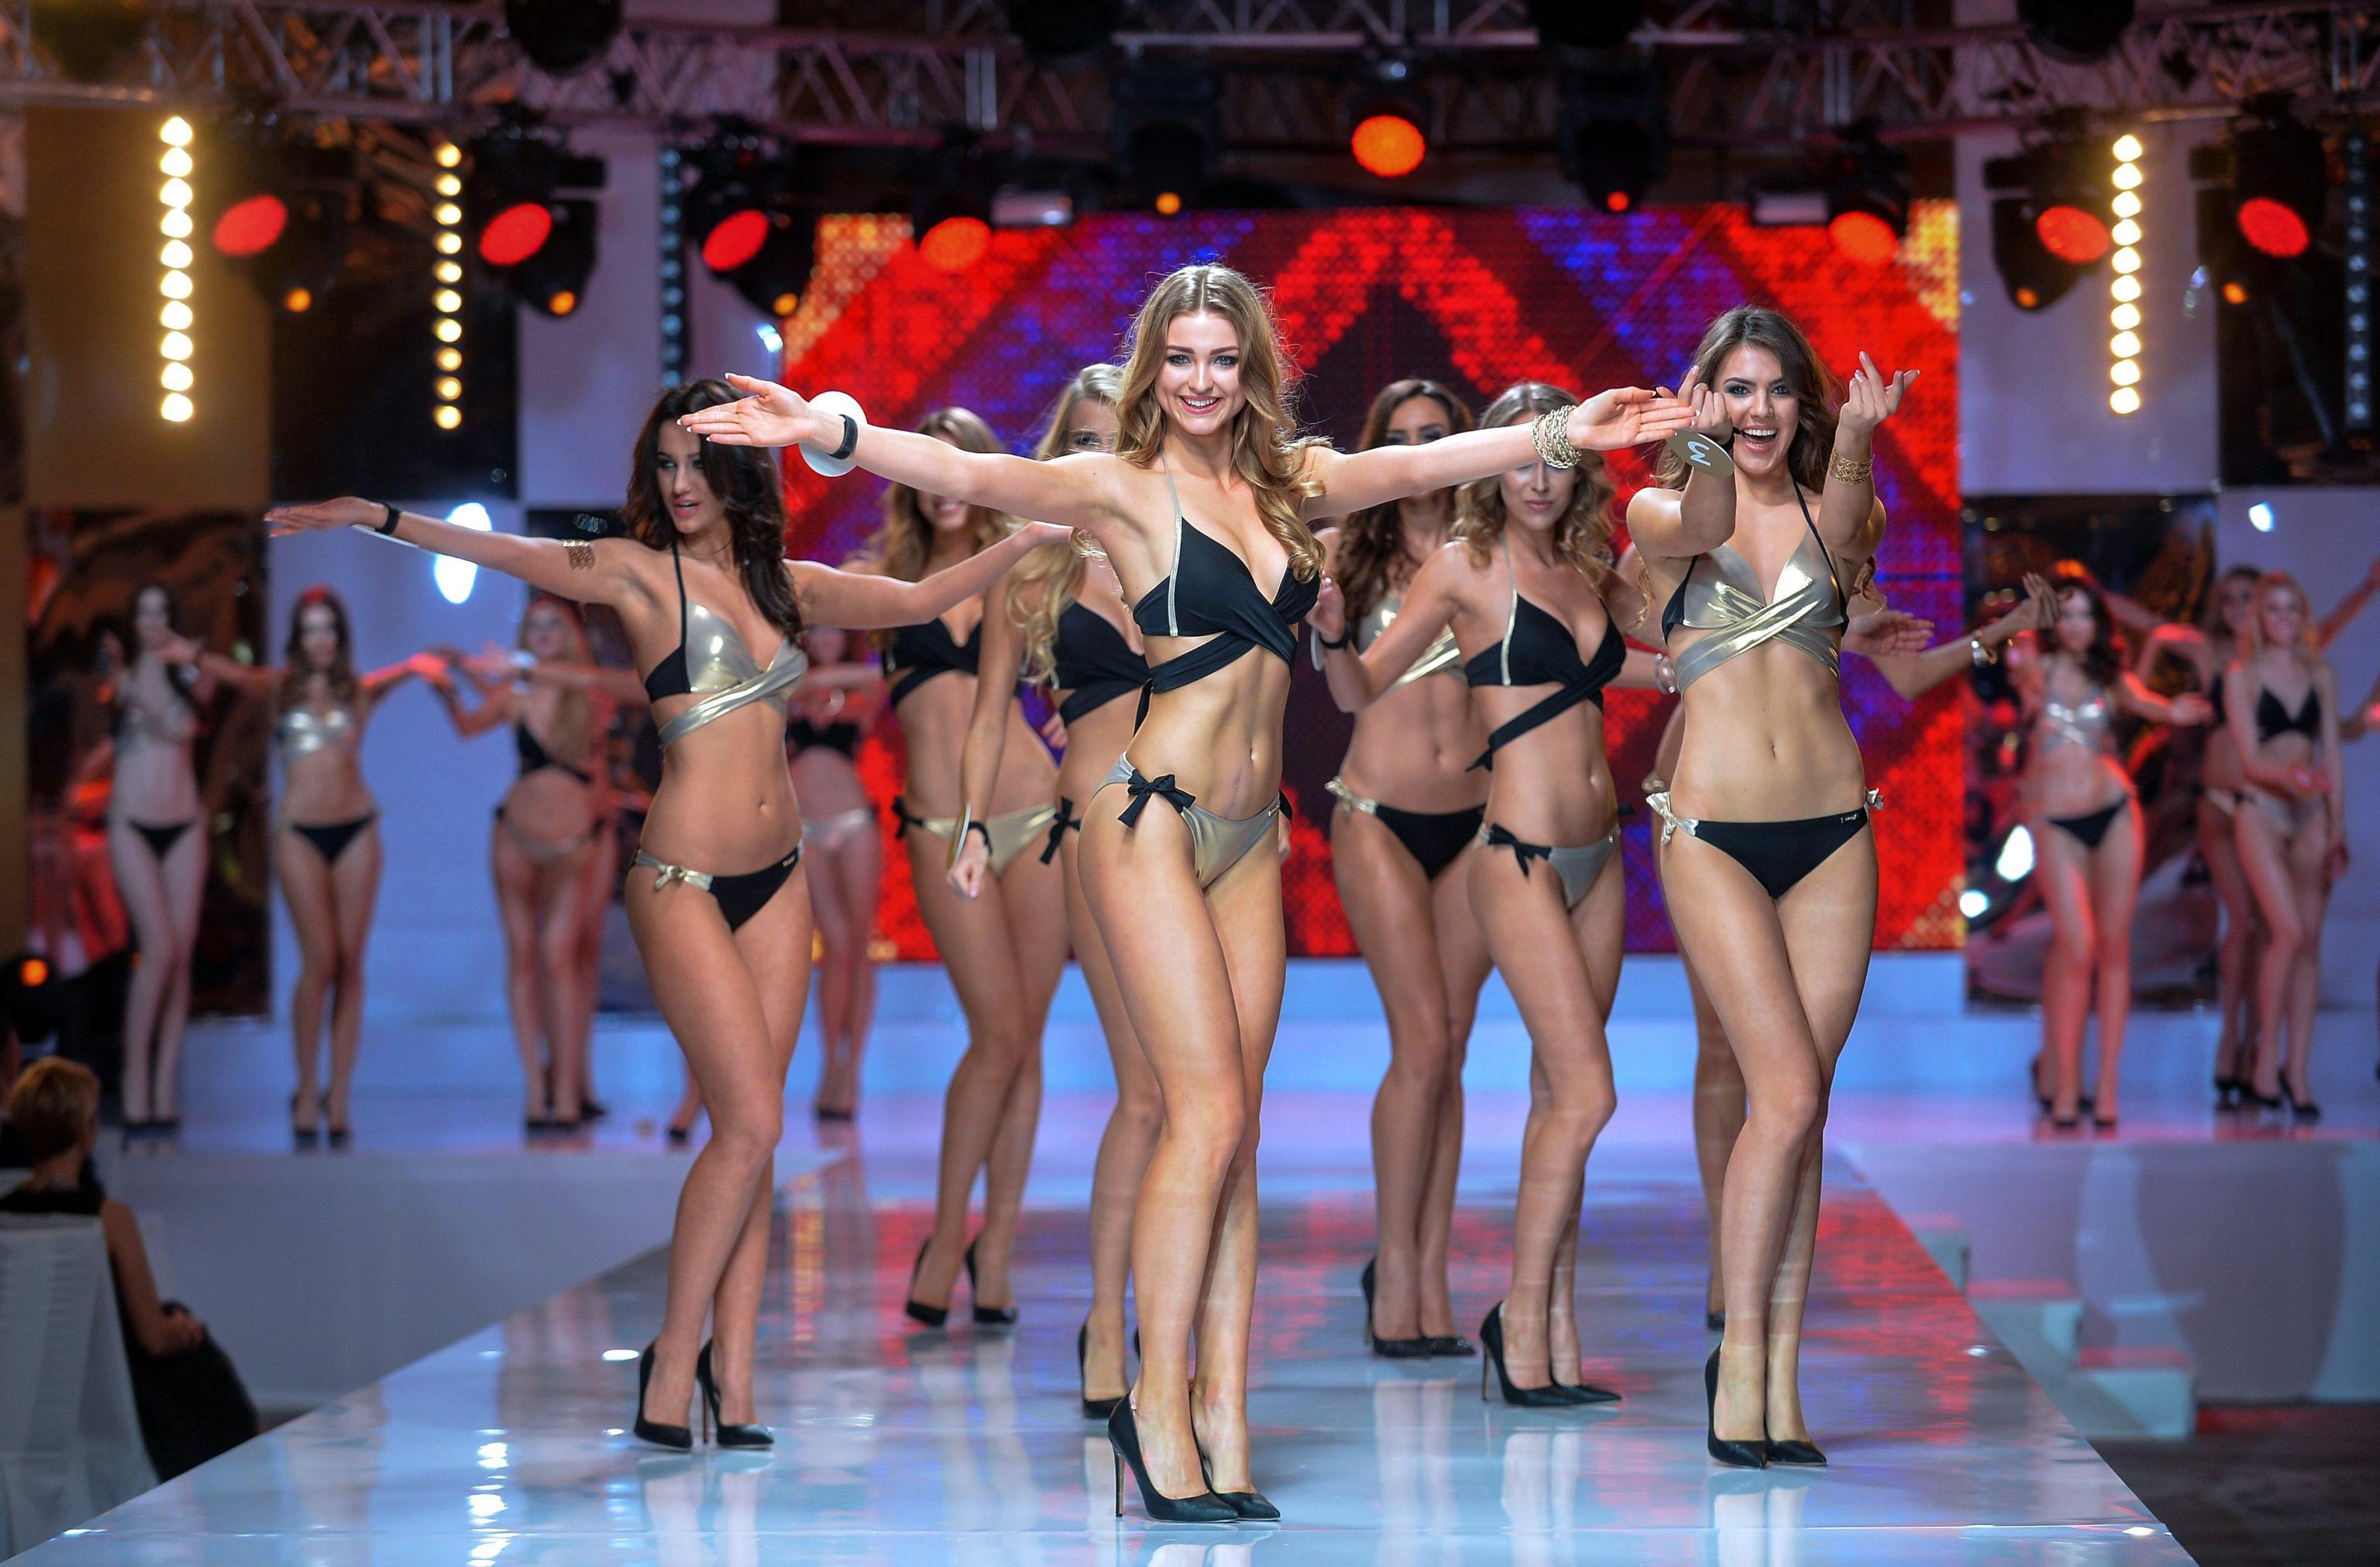 Miss America dice addio al bikini: niente più sfilate in costume da bagno